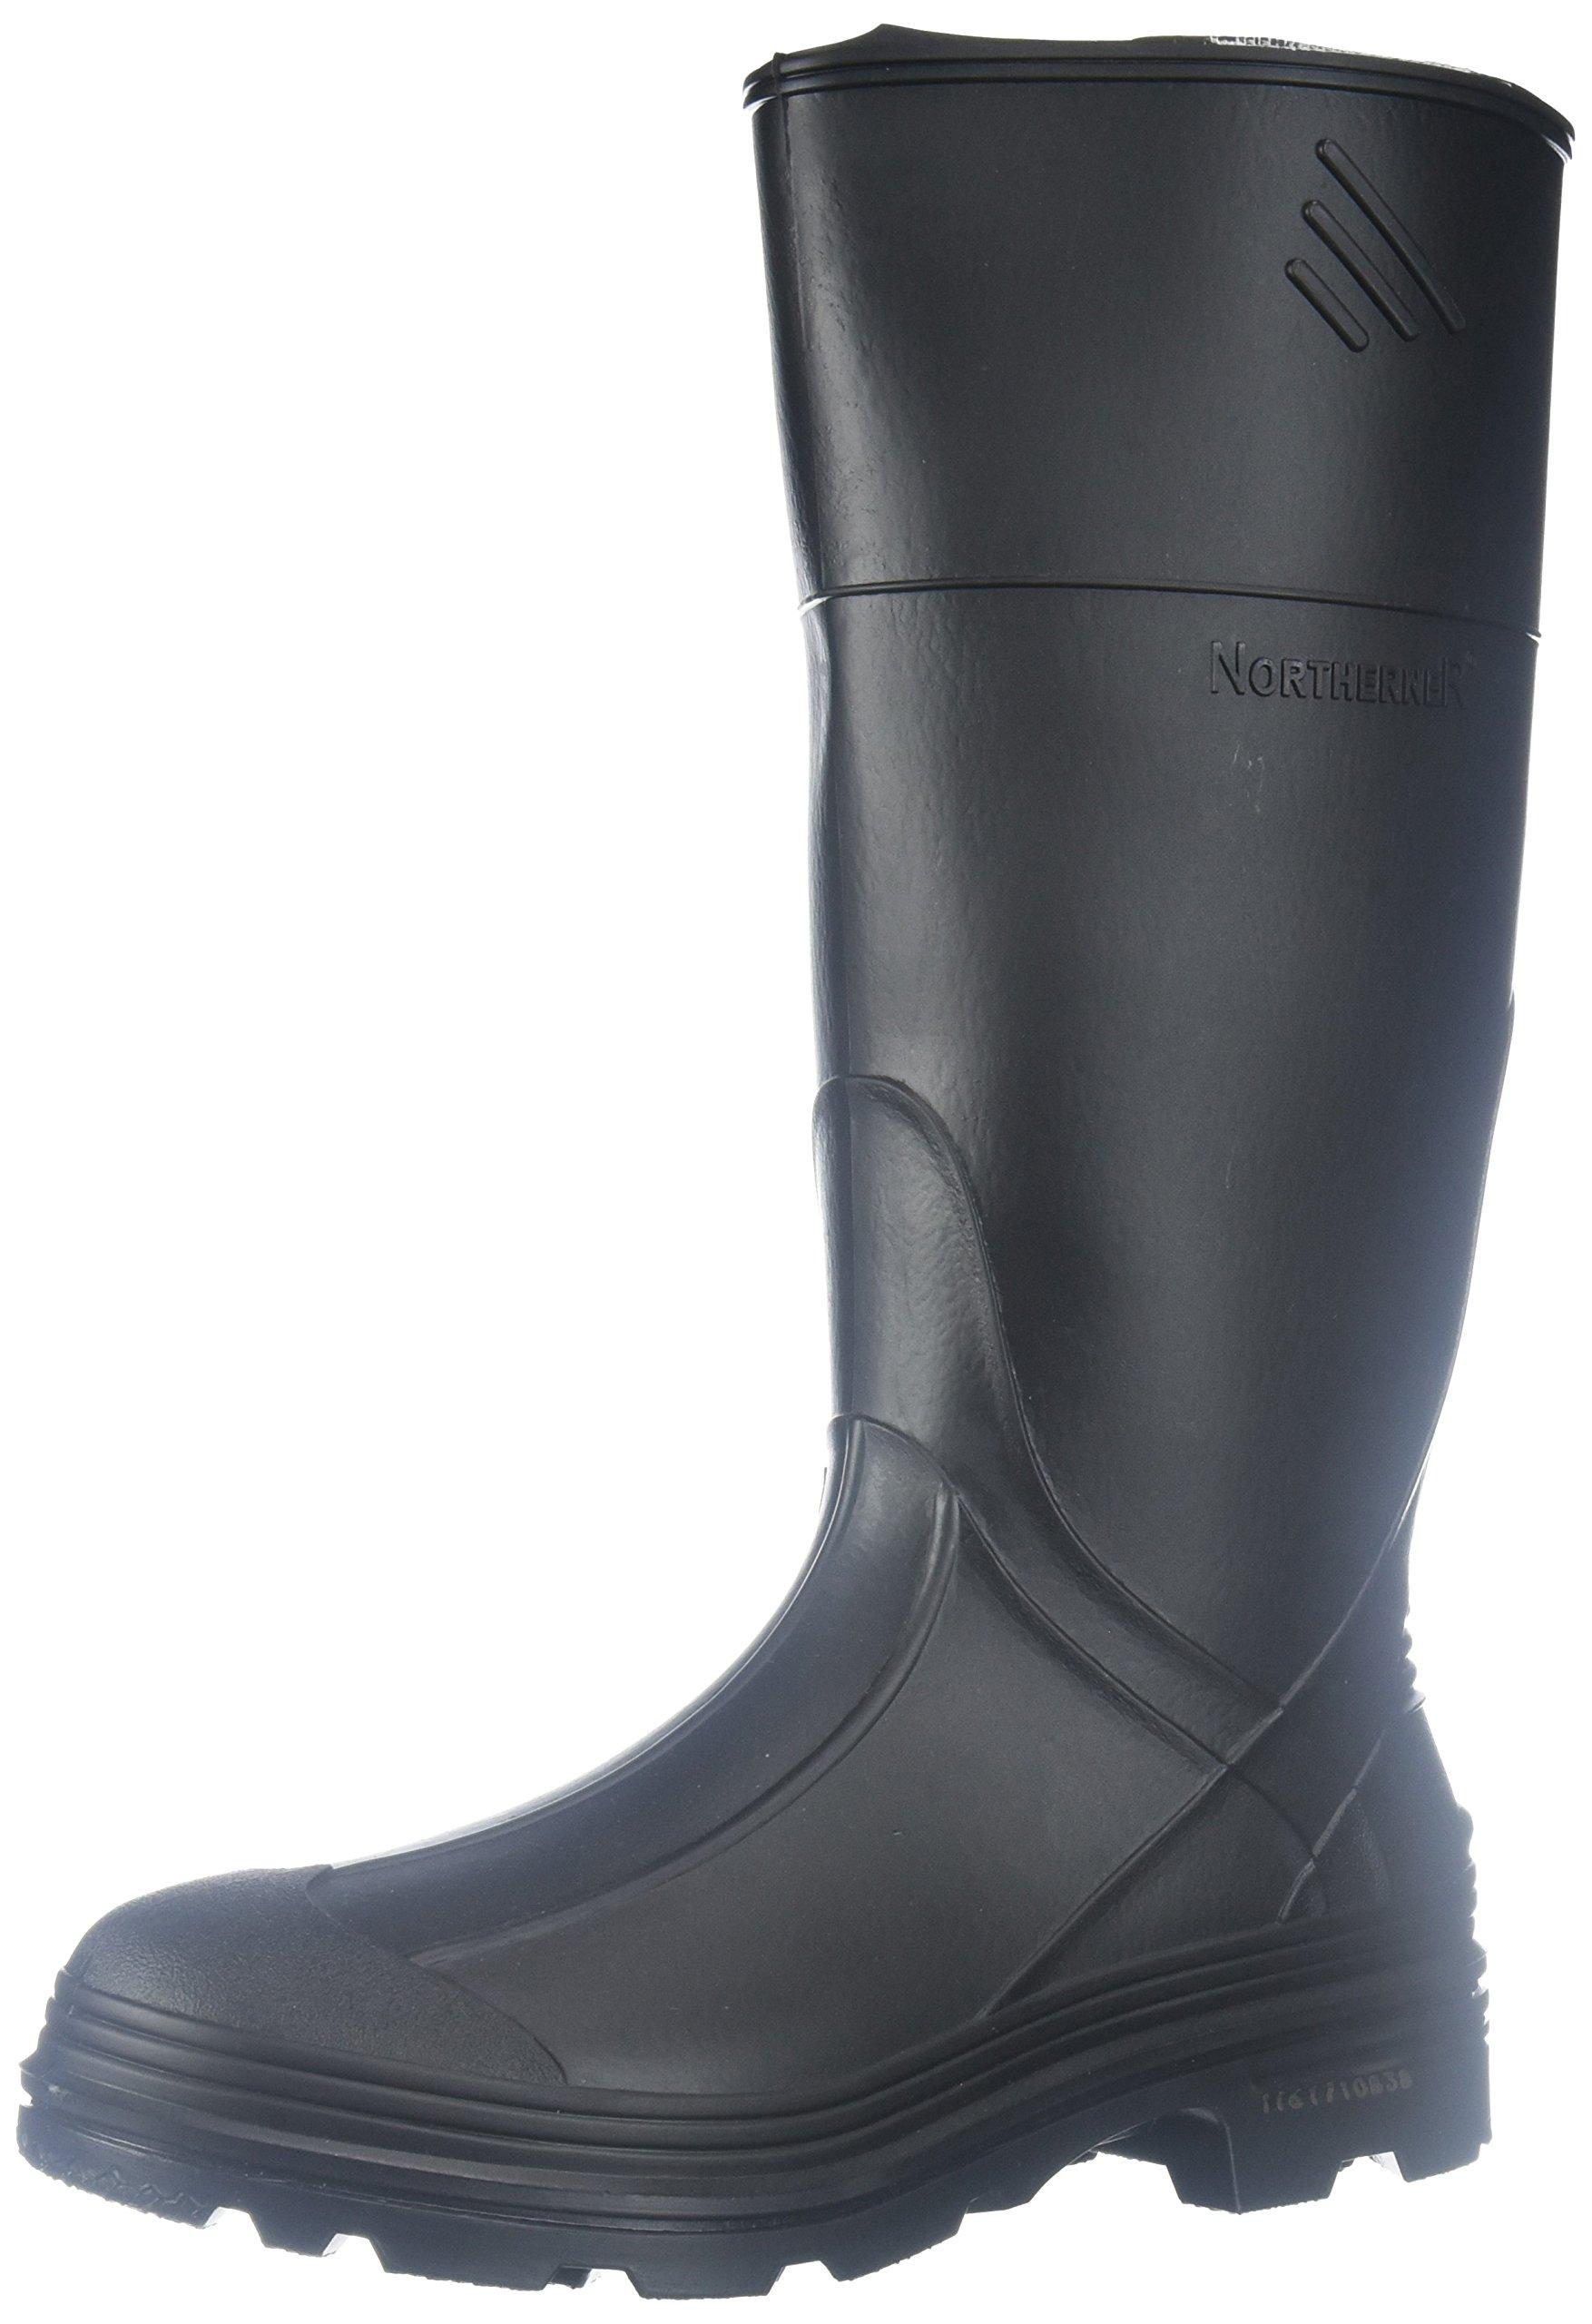 Ranger Splash Series Youths' Rain Boots, Black (76002)